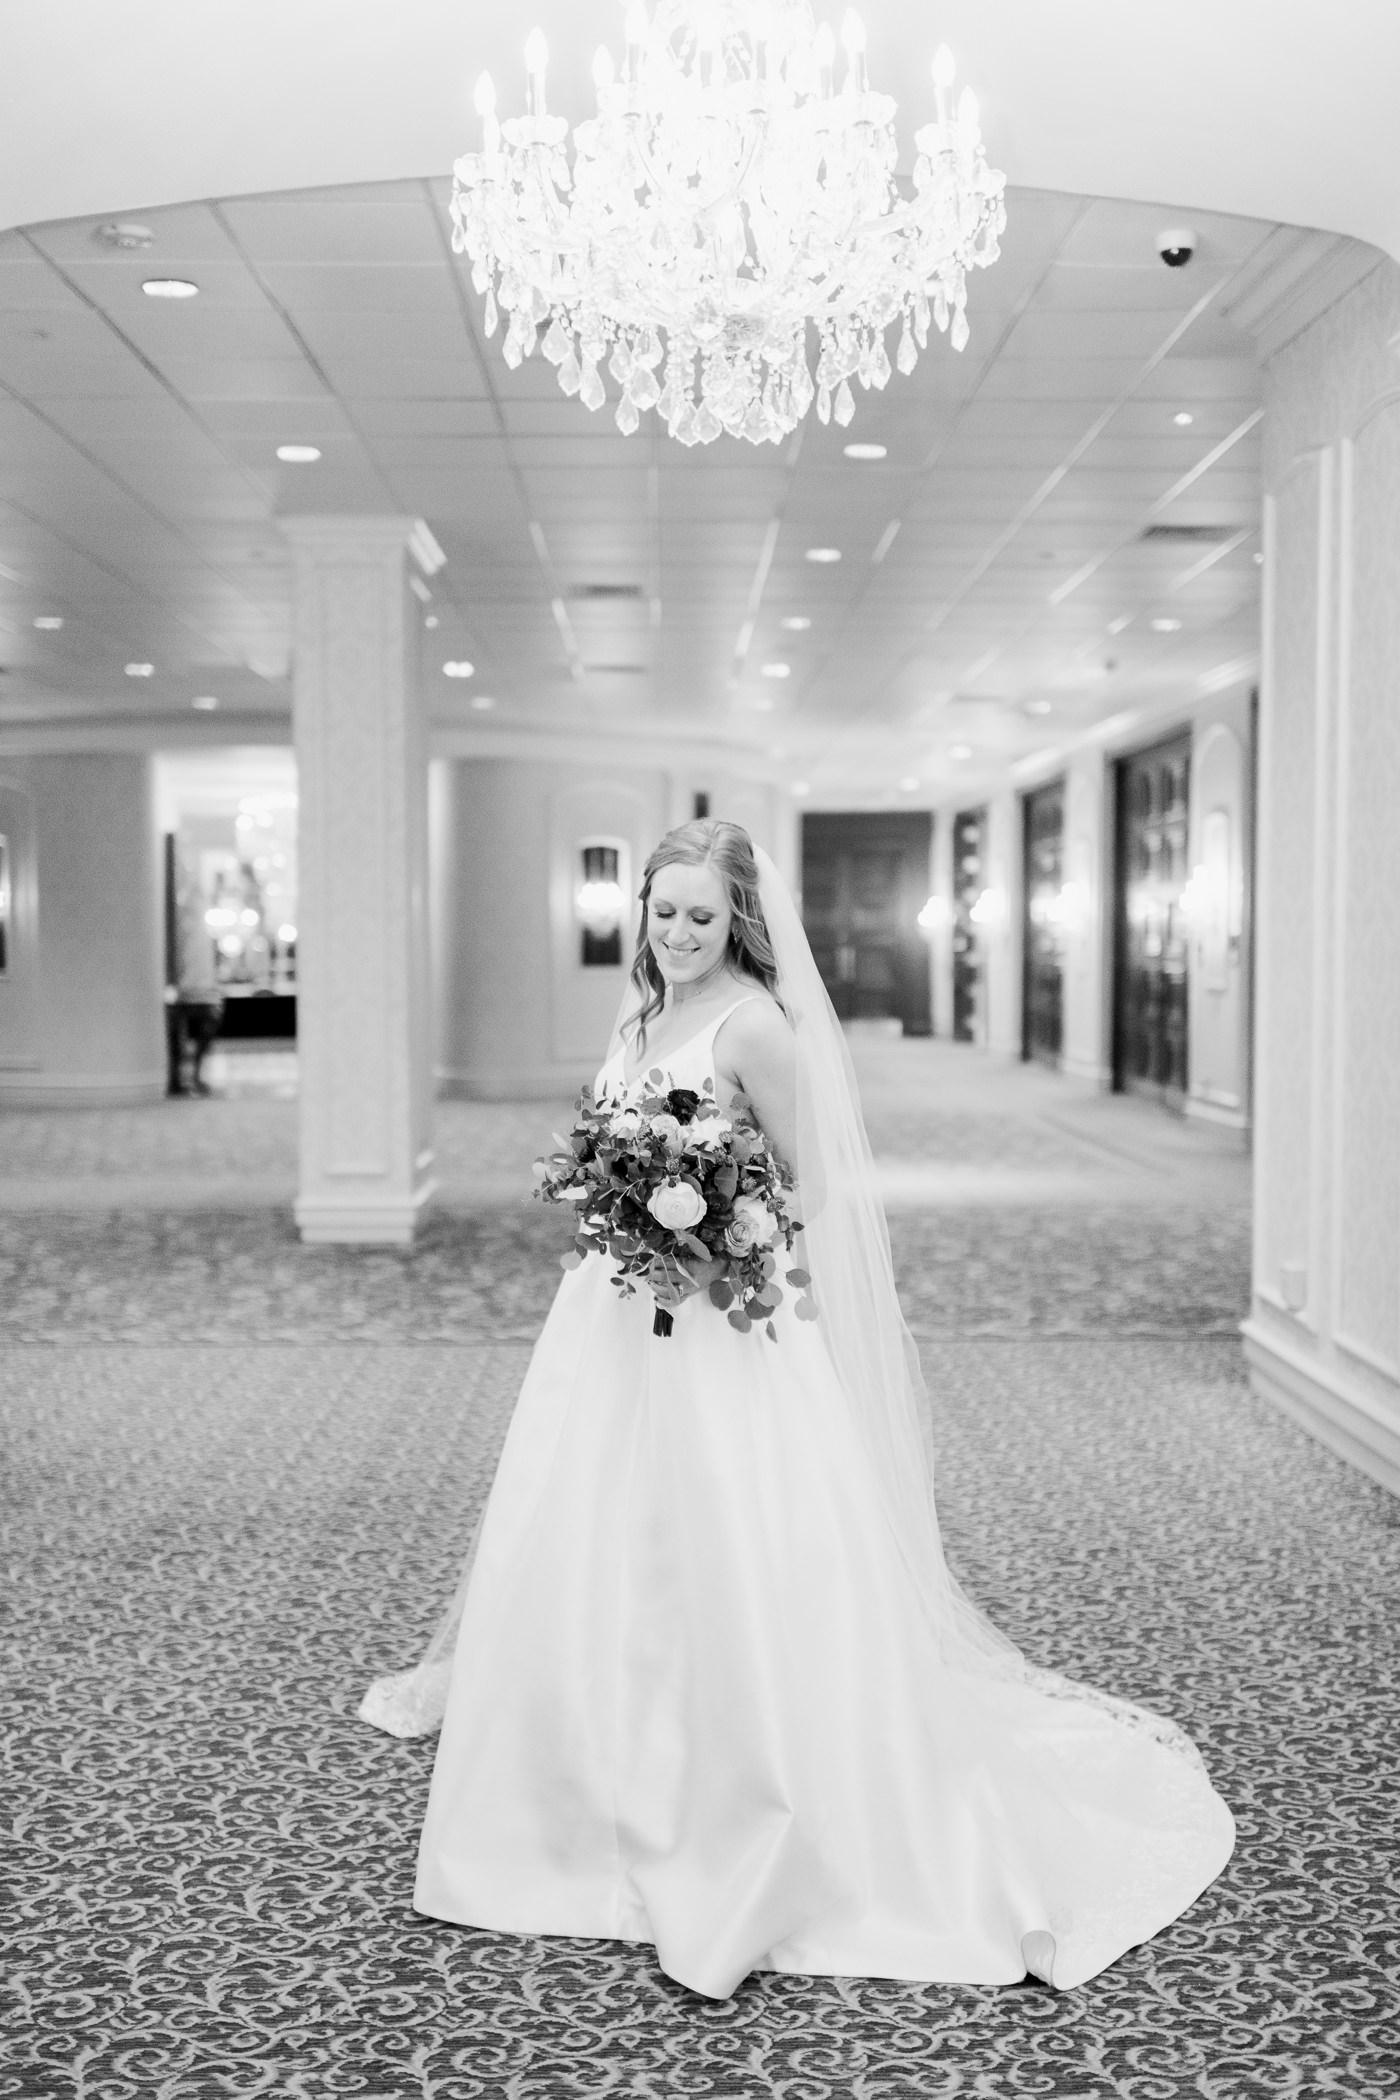 Pfister Hotel Wedding Photographers - Larissa Marie Photography